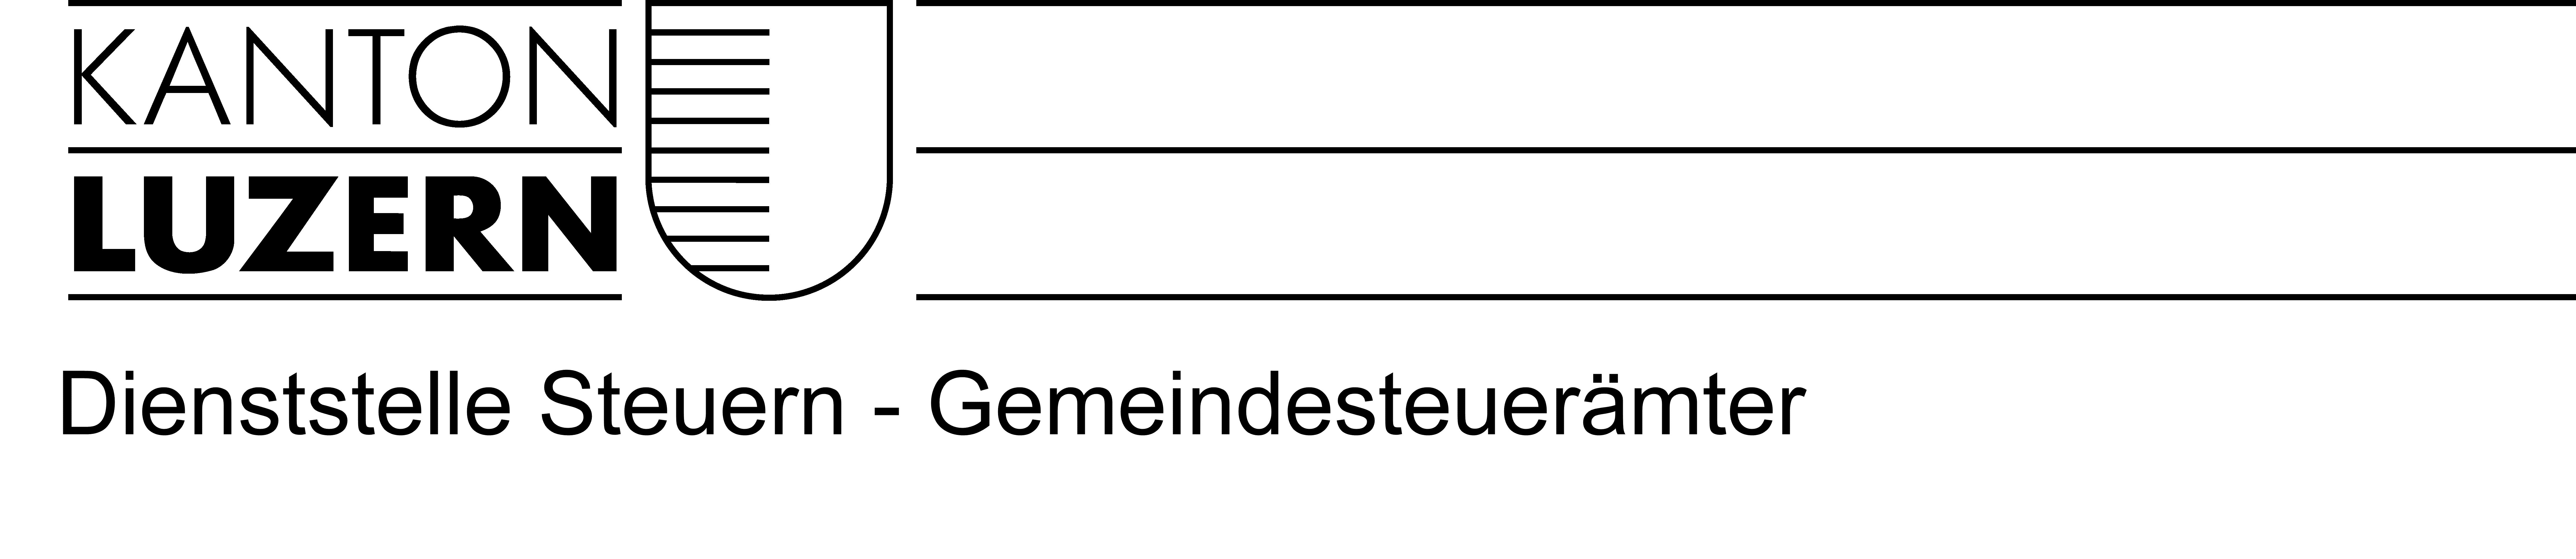 LogoL-EPost-LUv3